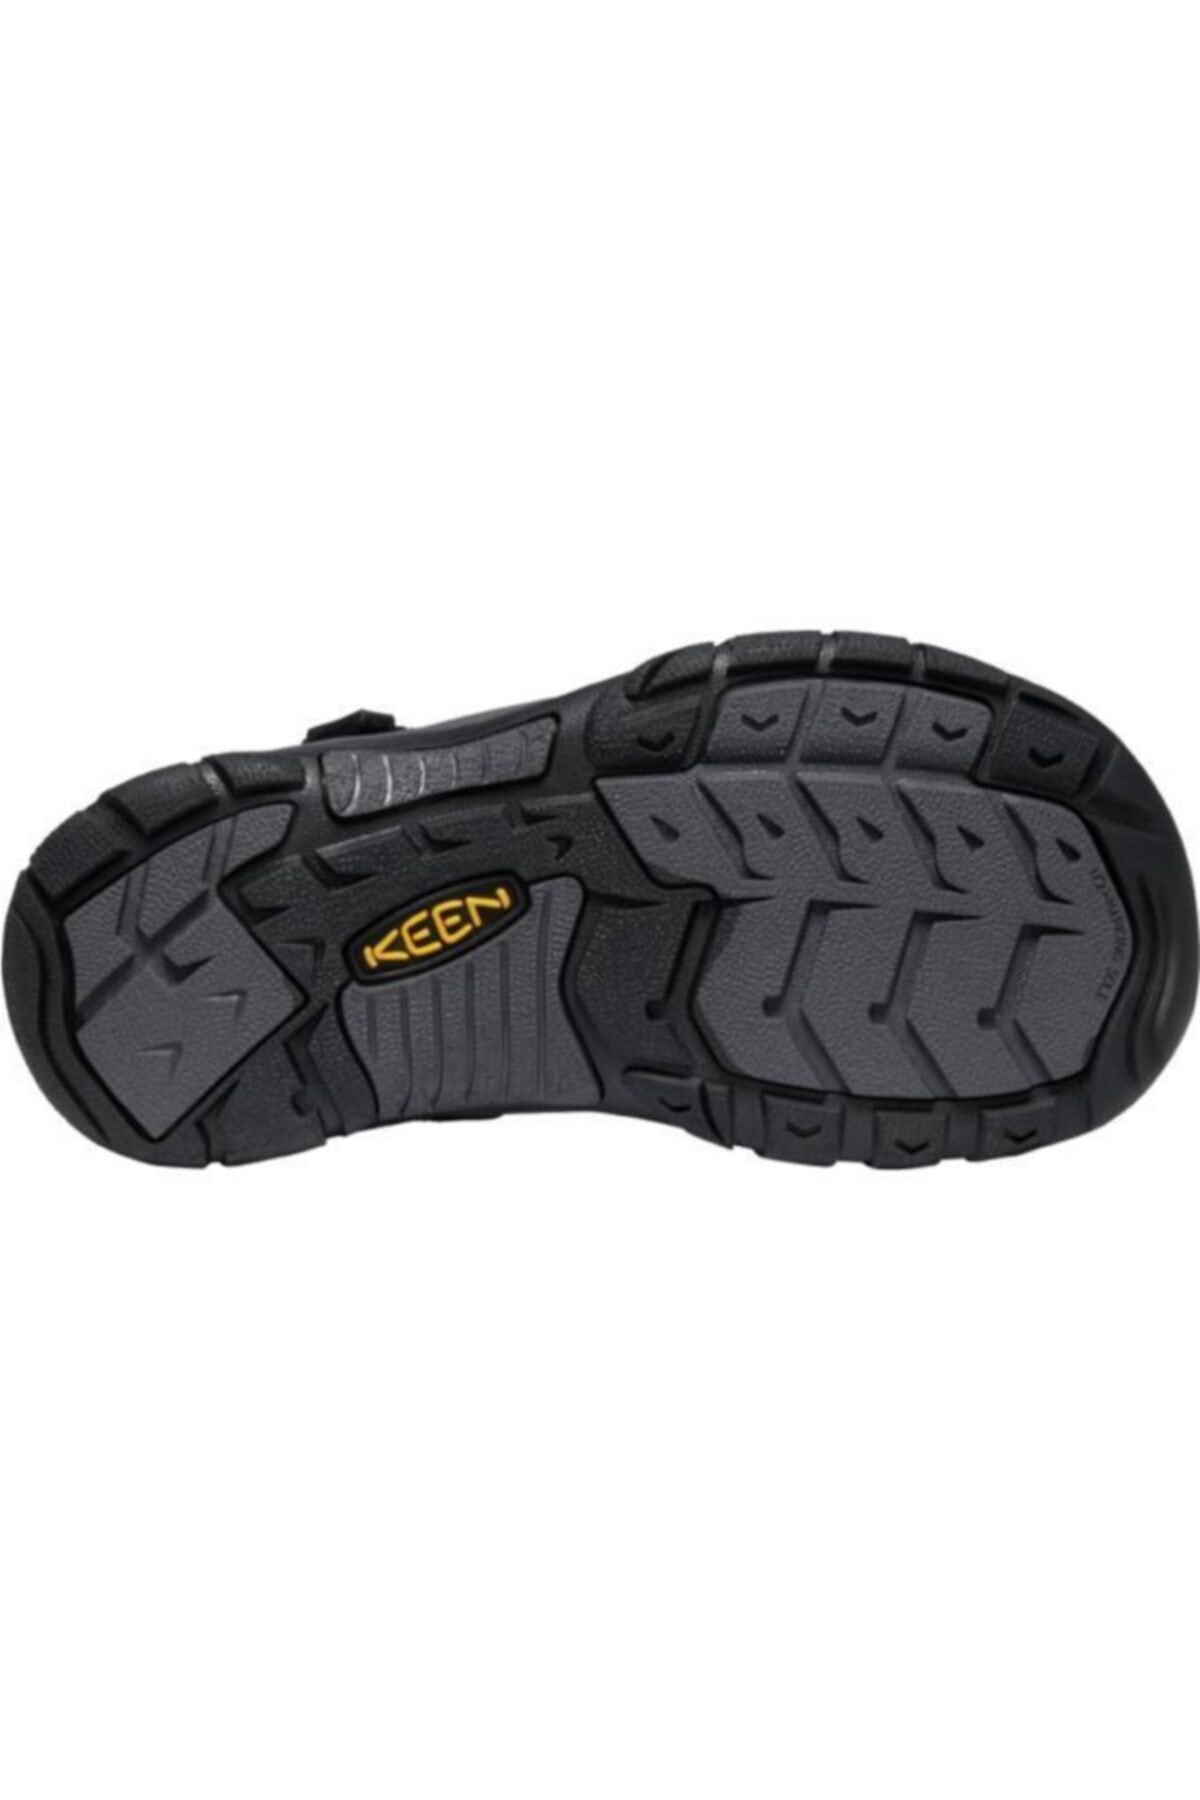 Keen Newport H2 Genç Sandalet Siyah 2